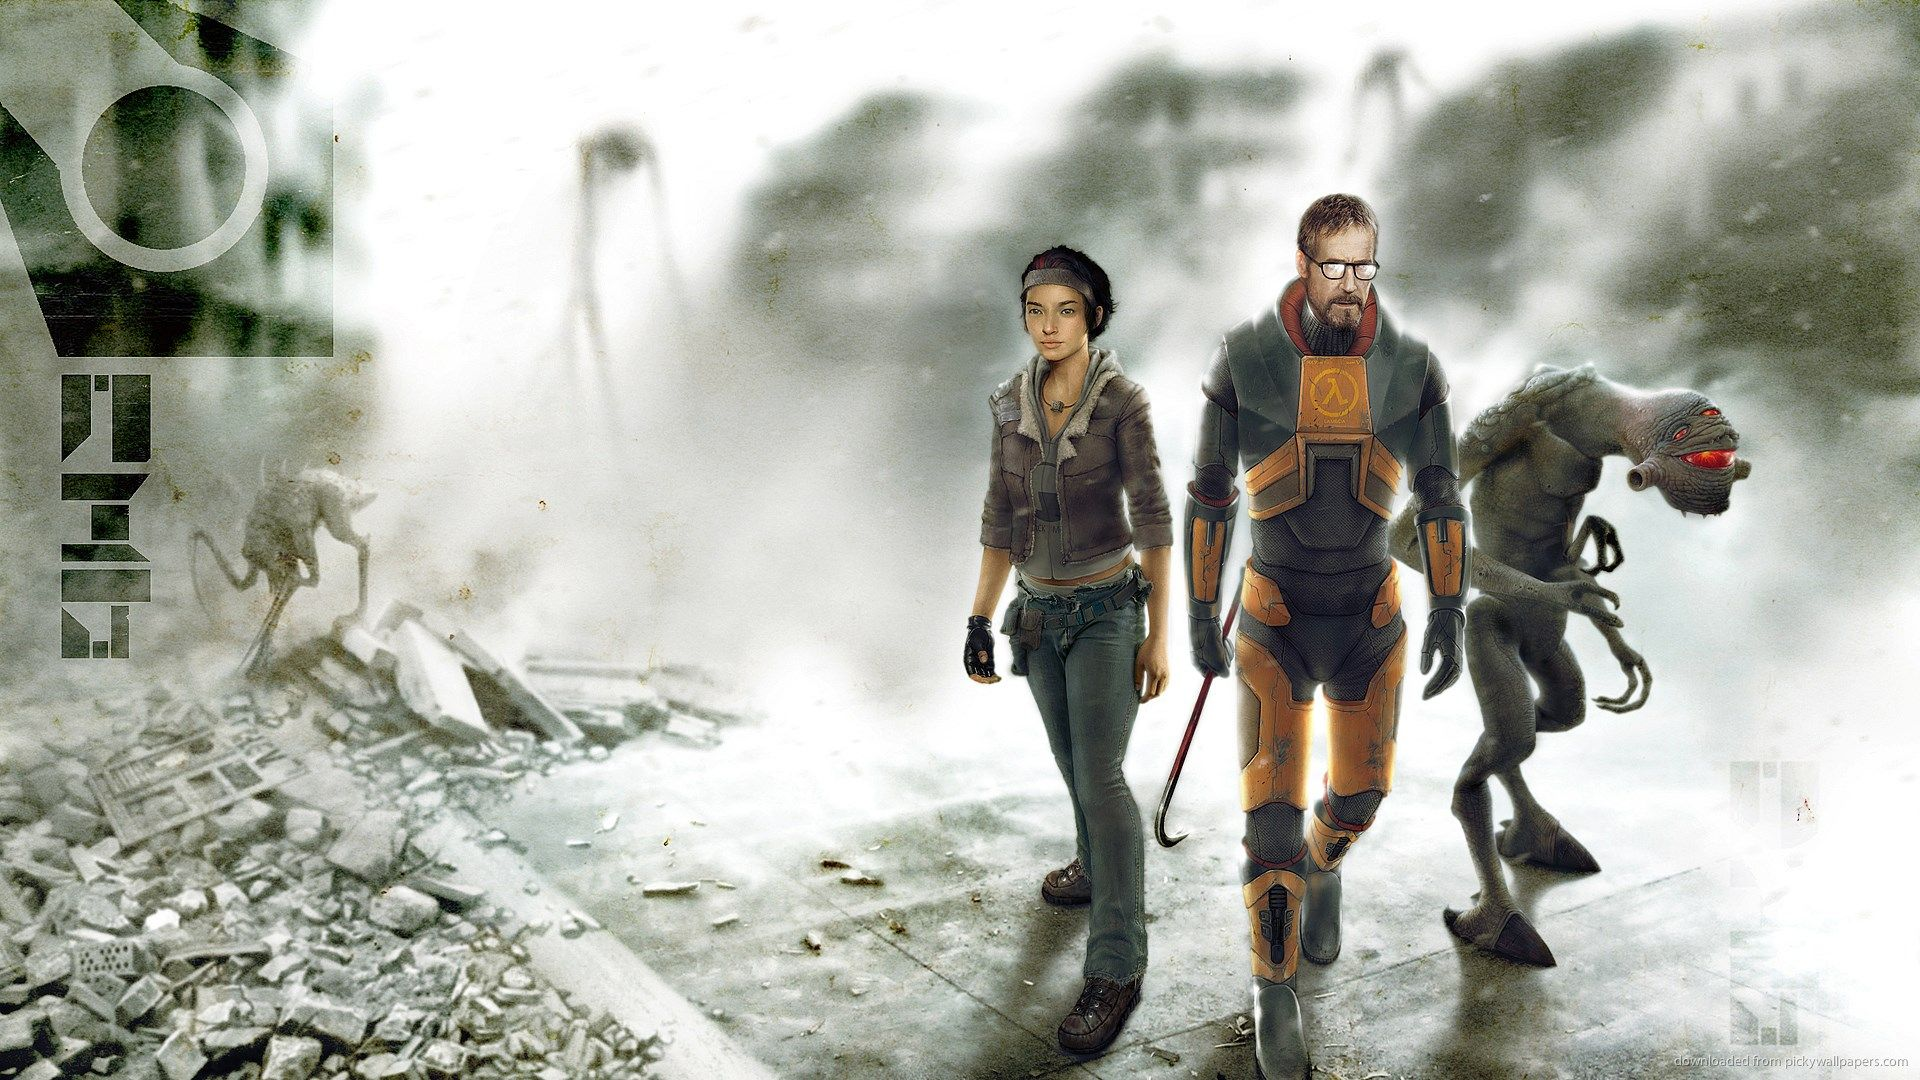 1920x1080 Half Life 2 Game Wallpaper